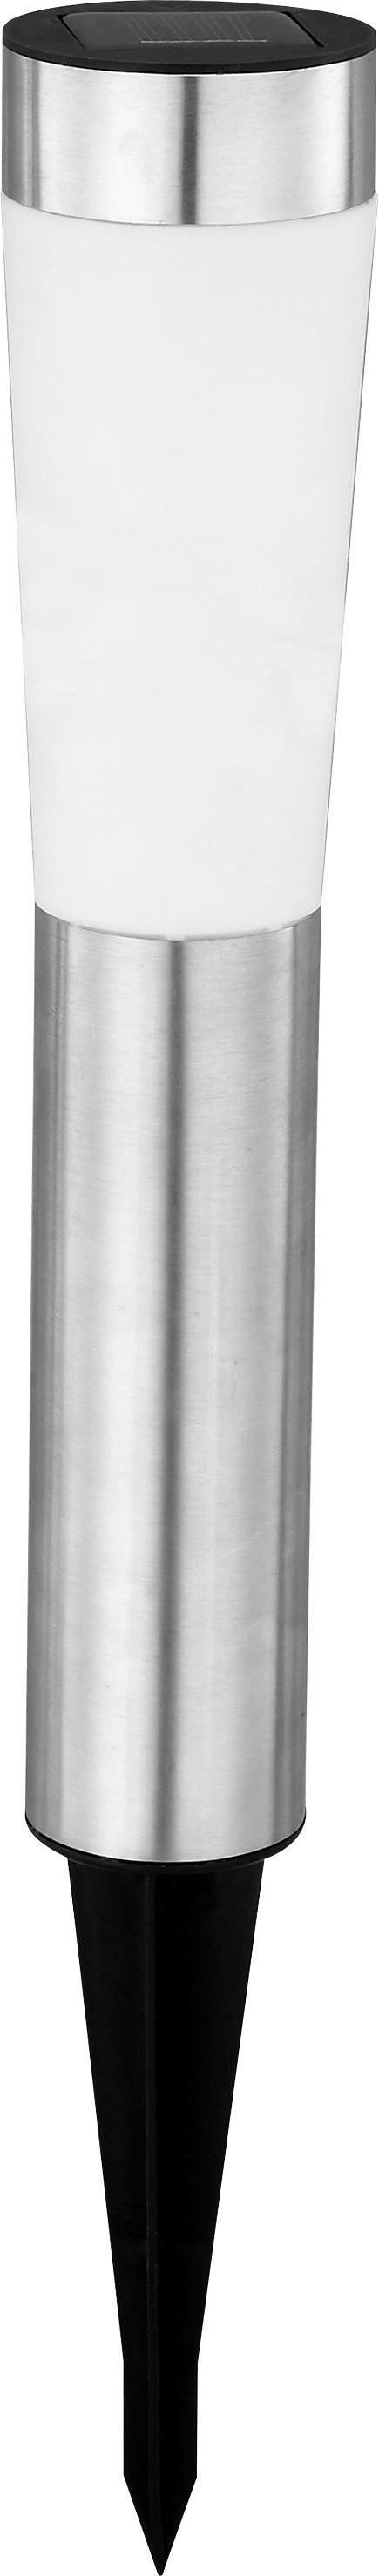 Solarleuchte Twins - Chromfarben/Weiß, Kunststoff/Metall (7,5/56cm) - Mömax modern living